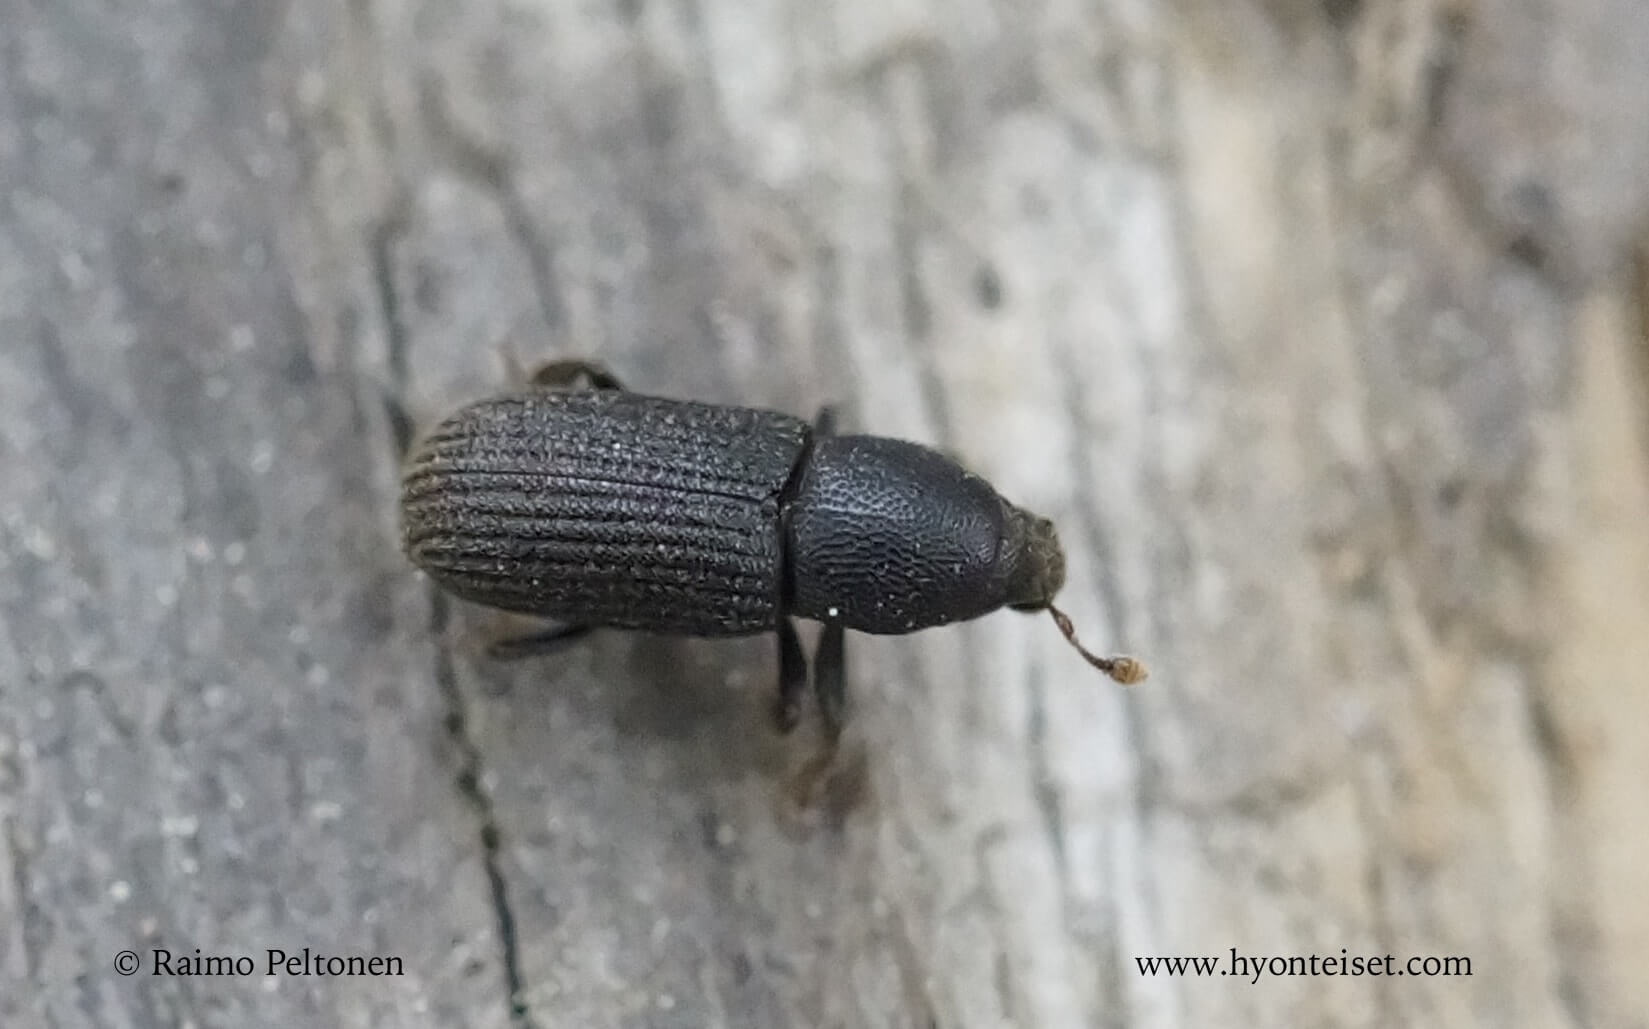 Hylastes cunicularius-kuusenniluri (det. Juha Salokannel)